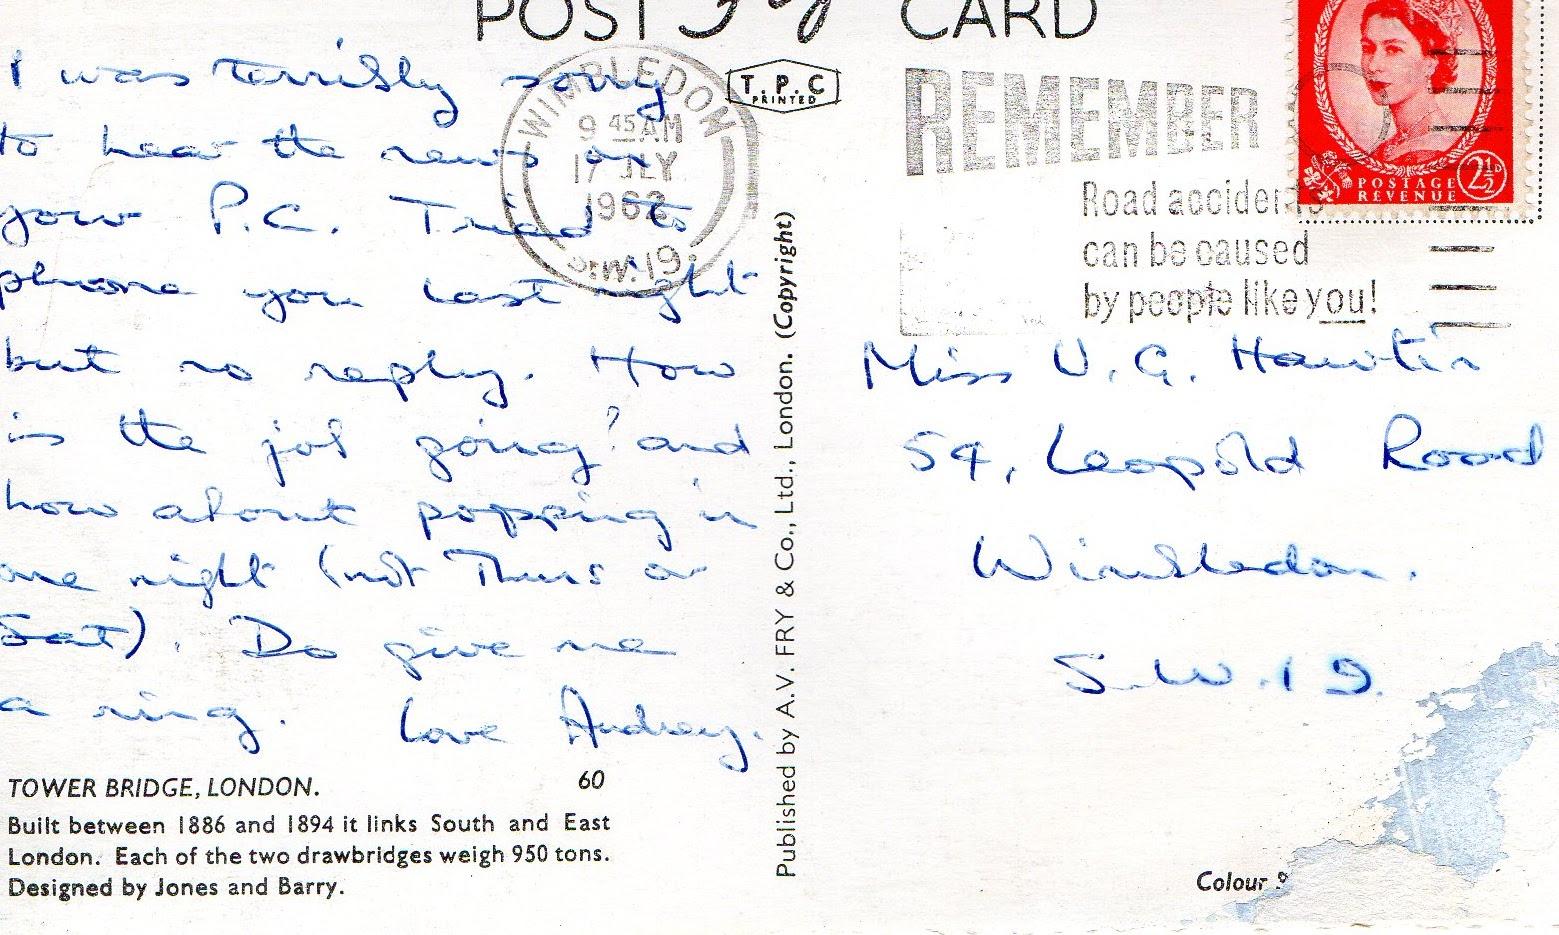 vintage, postcard, London,, handwriting, postmark, stamp, 1962, Wimbledon, Tower Bridge,